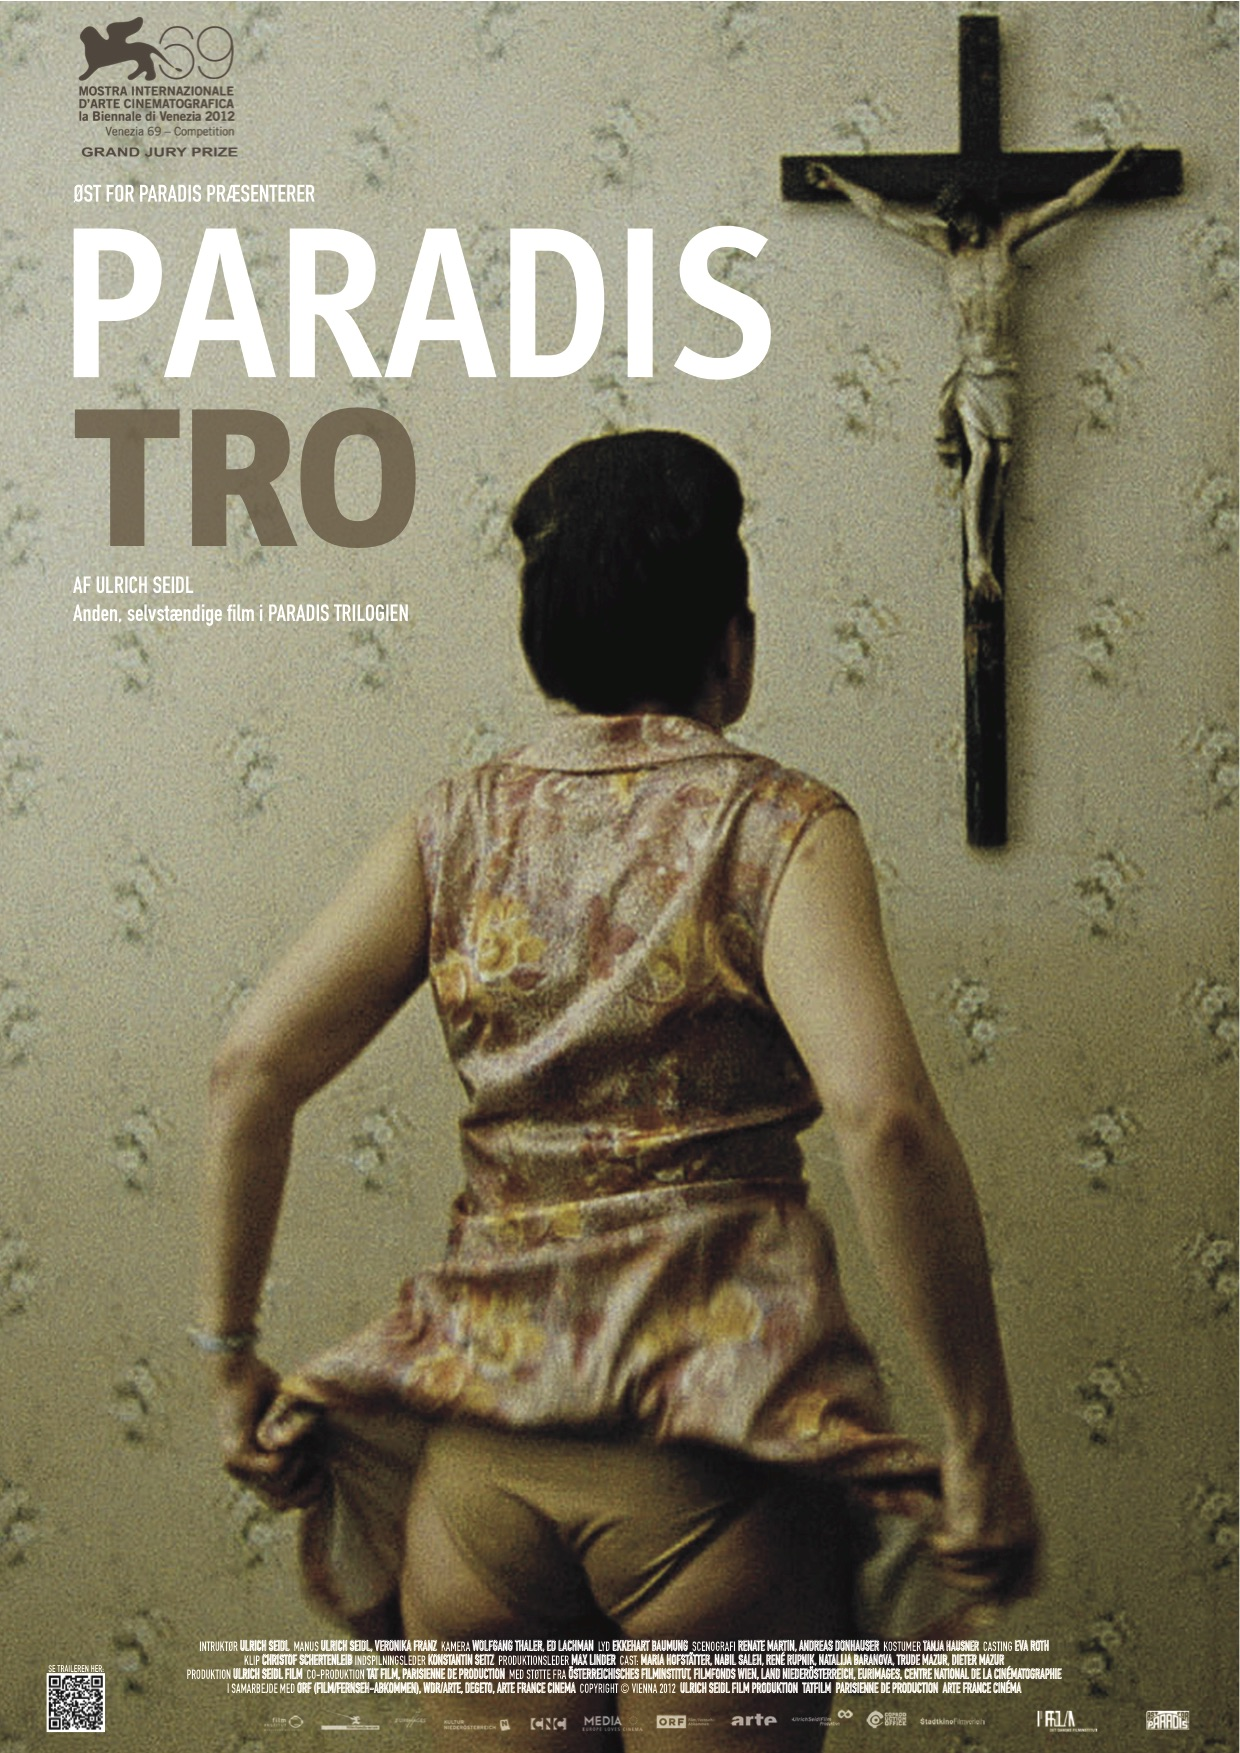 Paradis: Tro